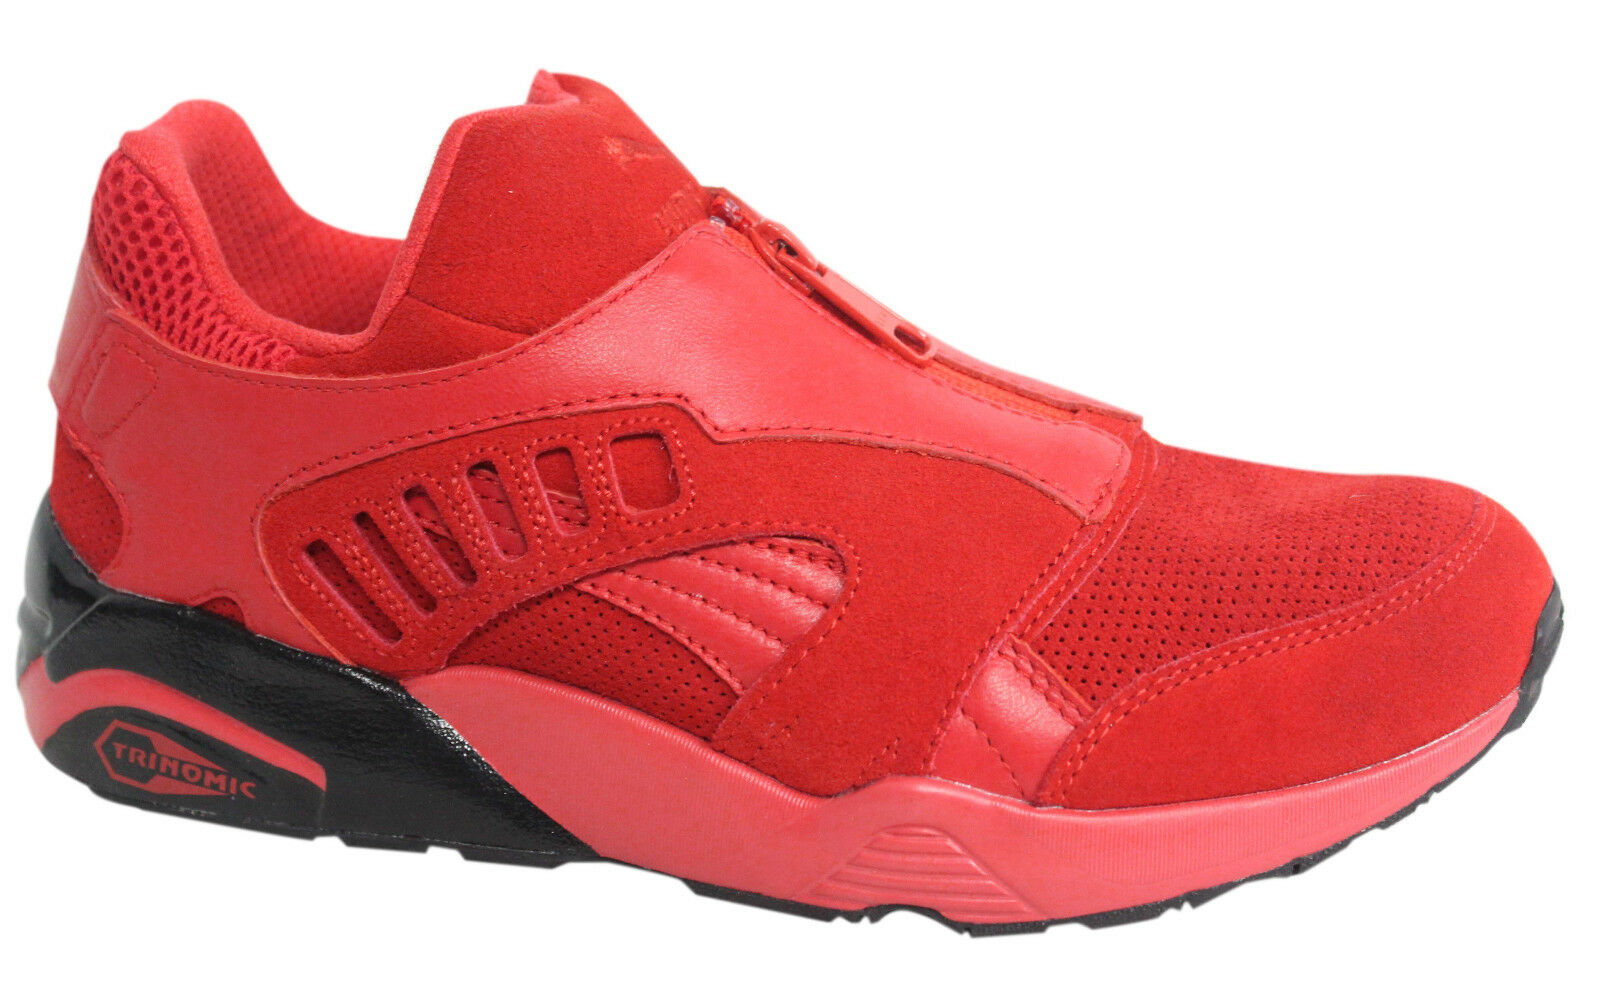 Puma Trinomic Red Leather Zip Up Mens Trainers 361448 01 U107